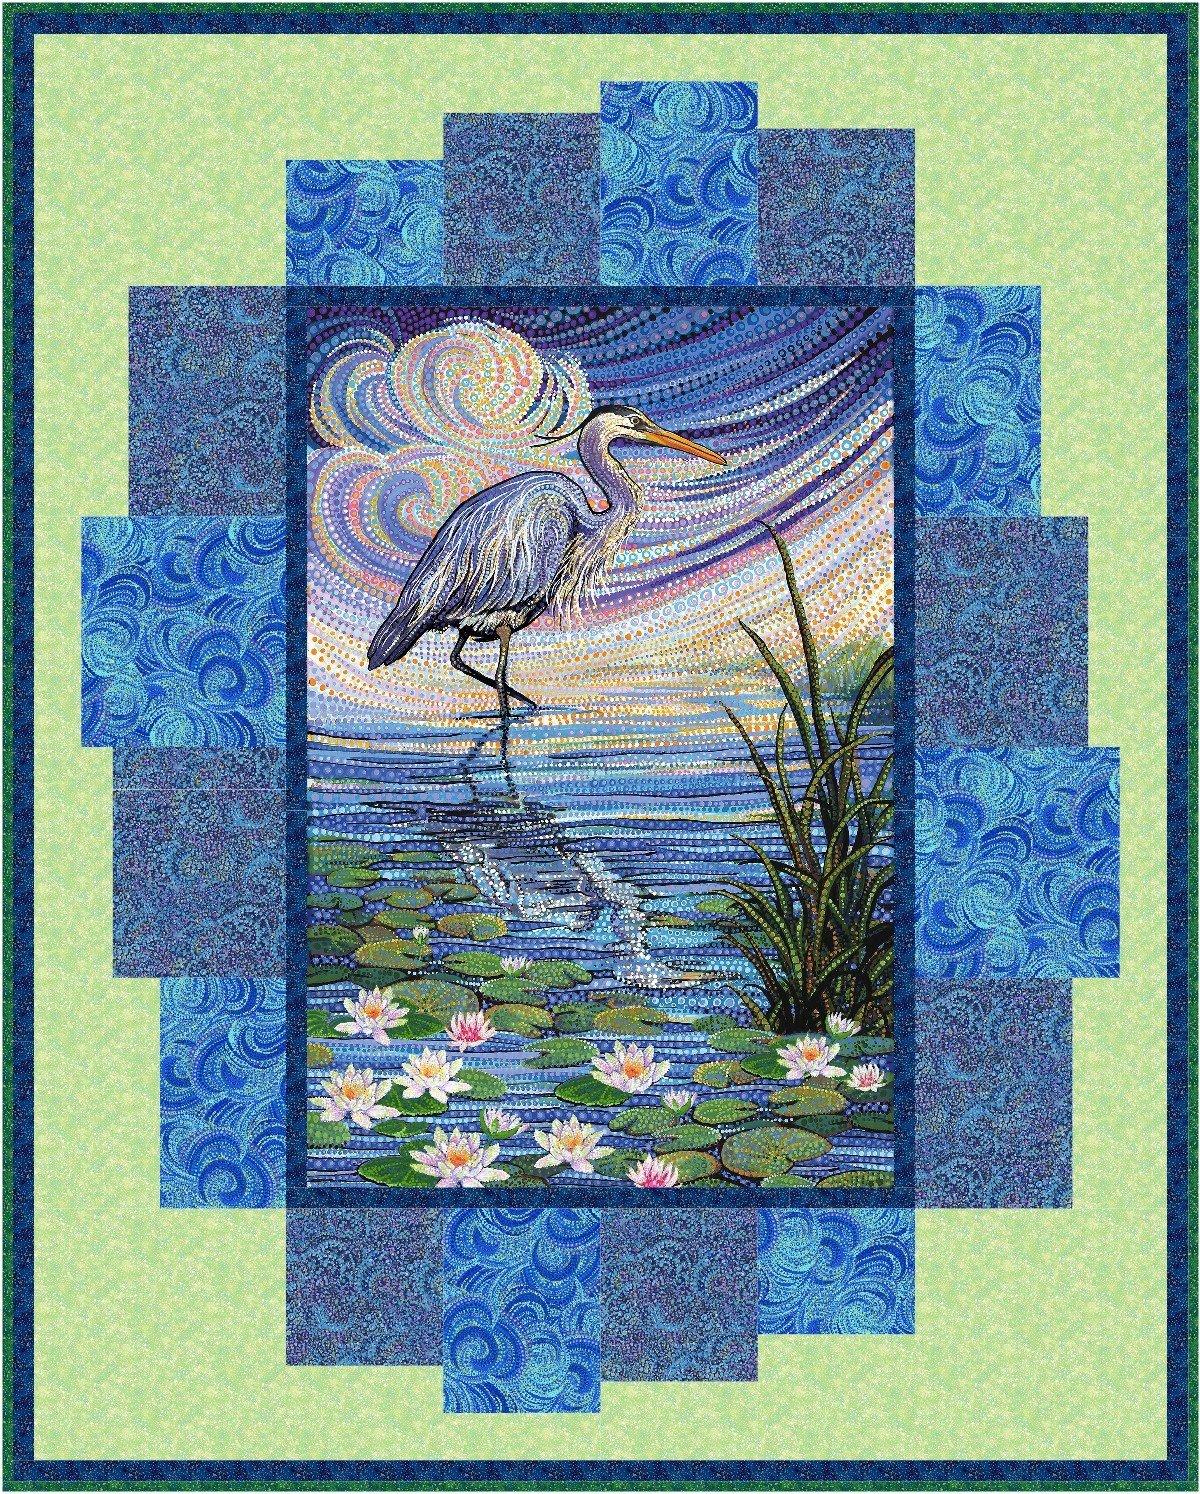 Water Garden Quilt